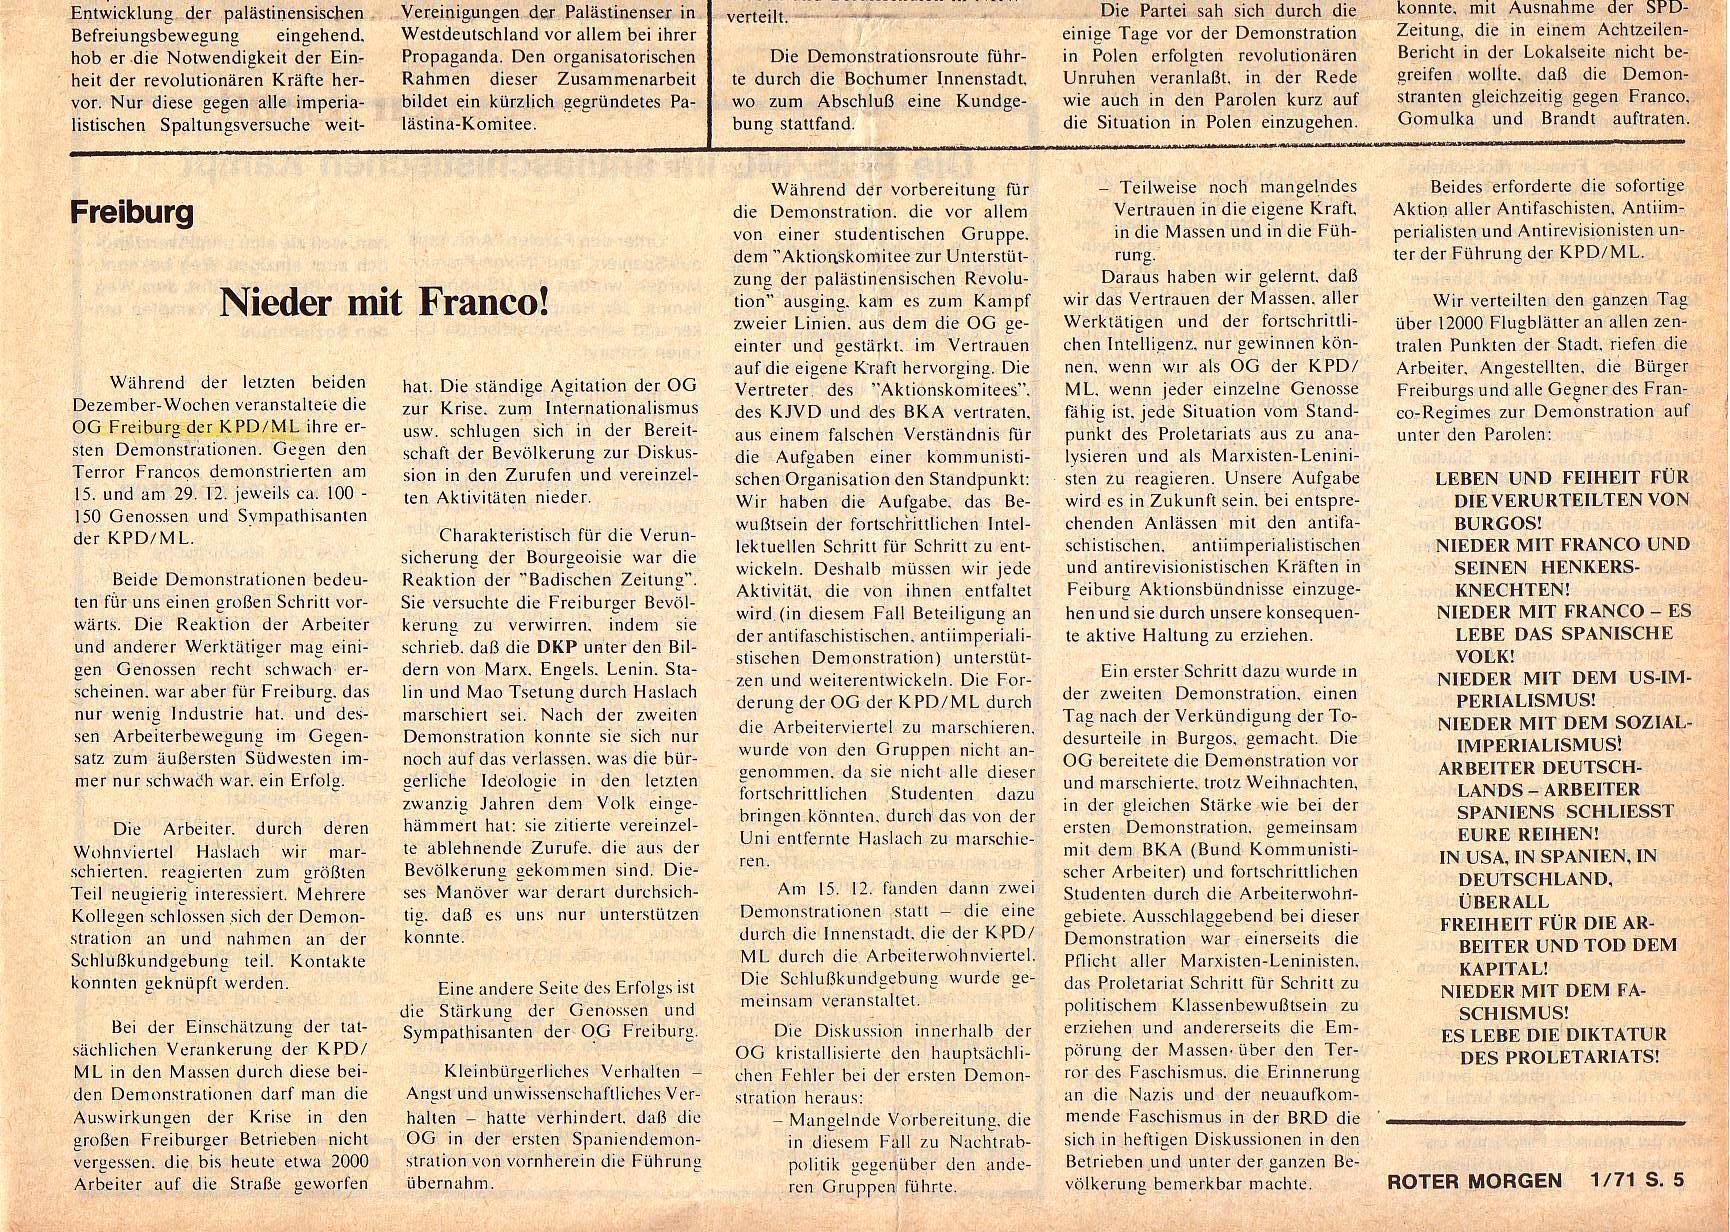 Roter Morgen, 5. Jg., Januar 1971, Nr. 1, Seite 5b